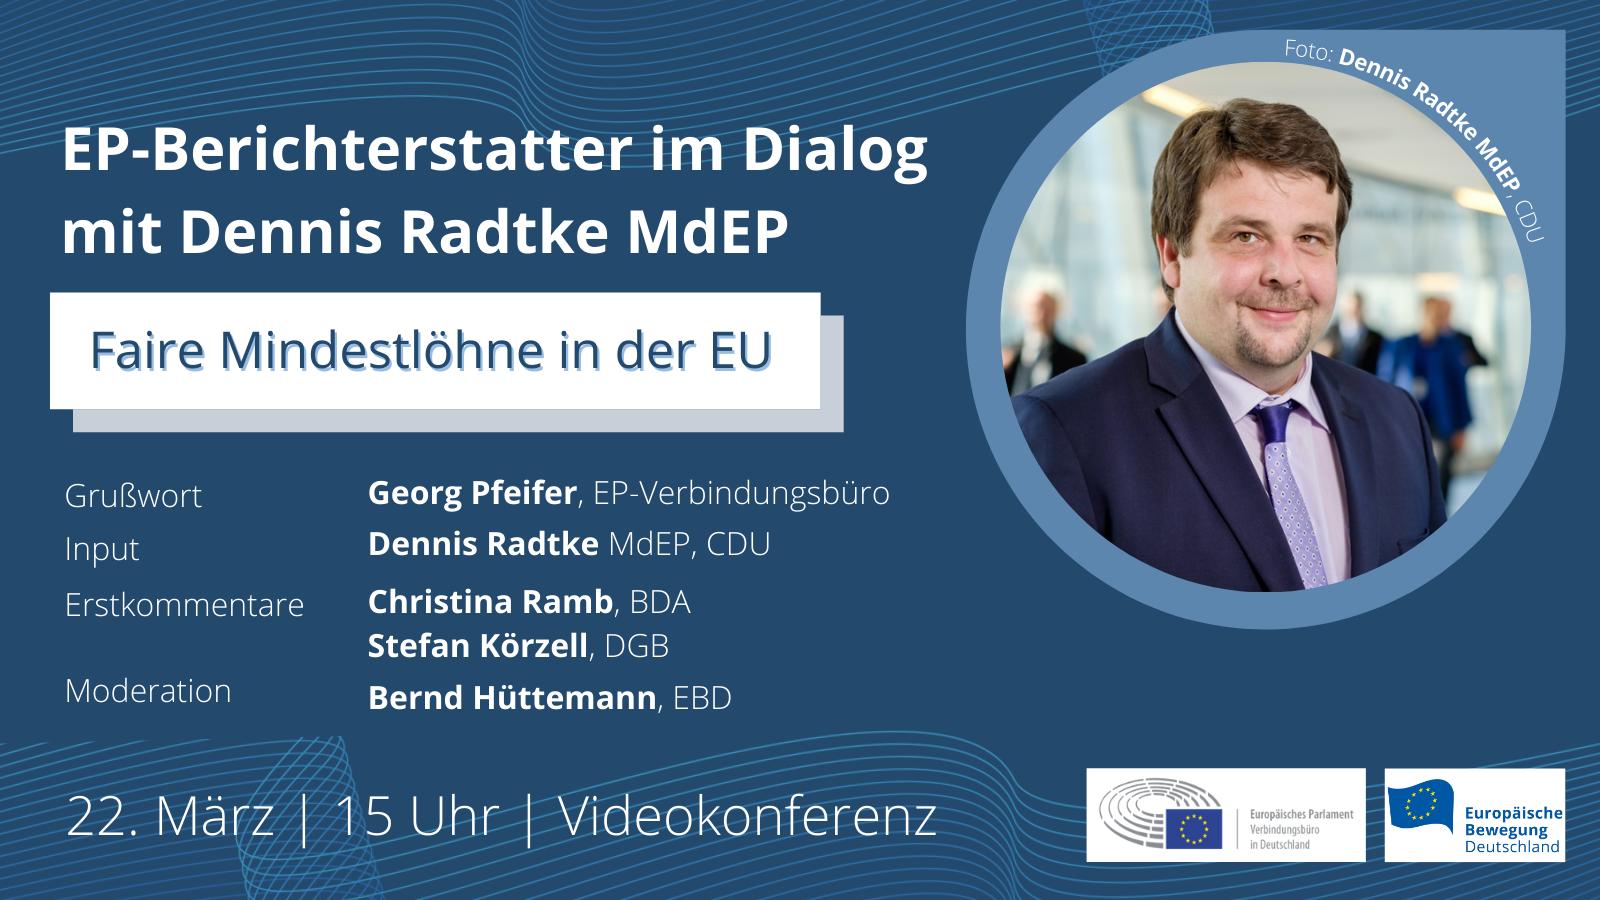 EP-Berichterstatter im Dialog: Dennis Radtke   22.03.2021